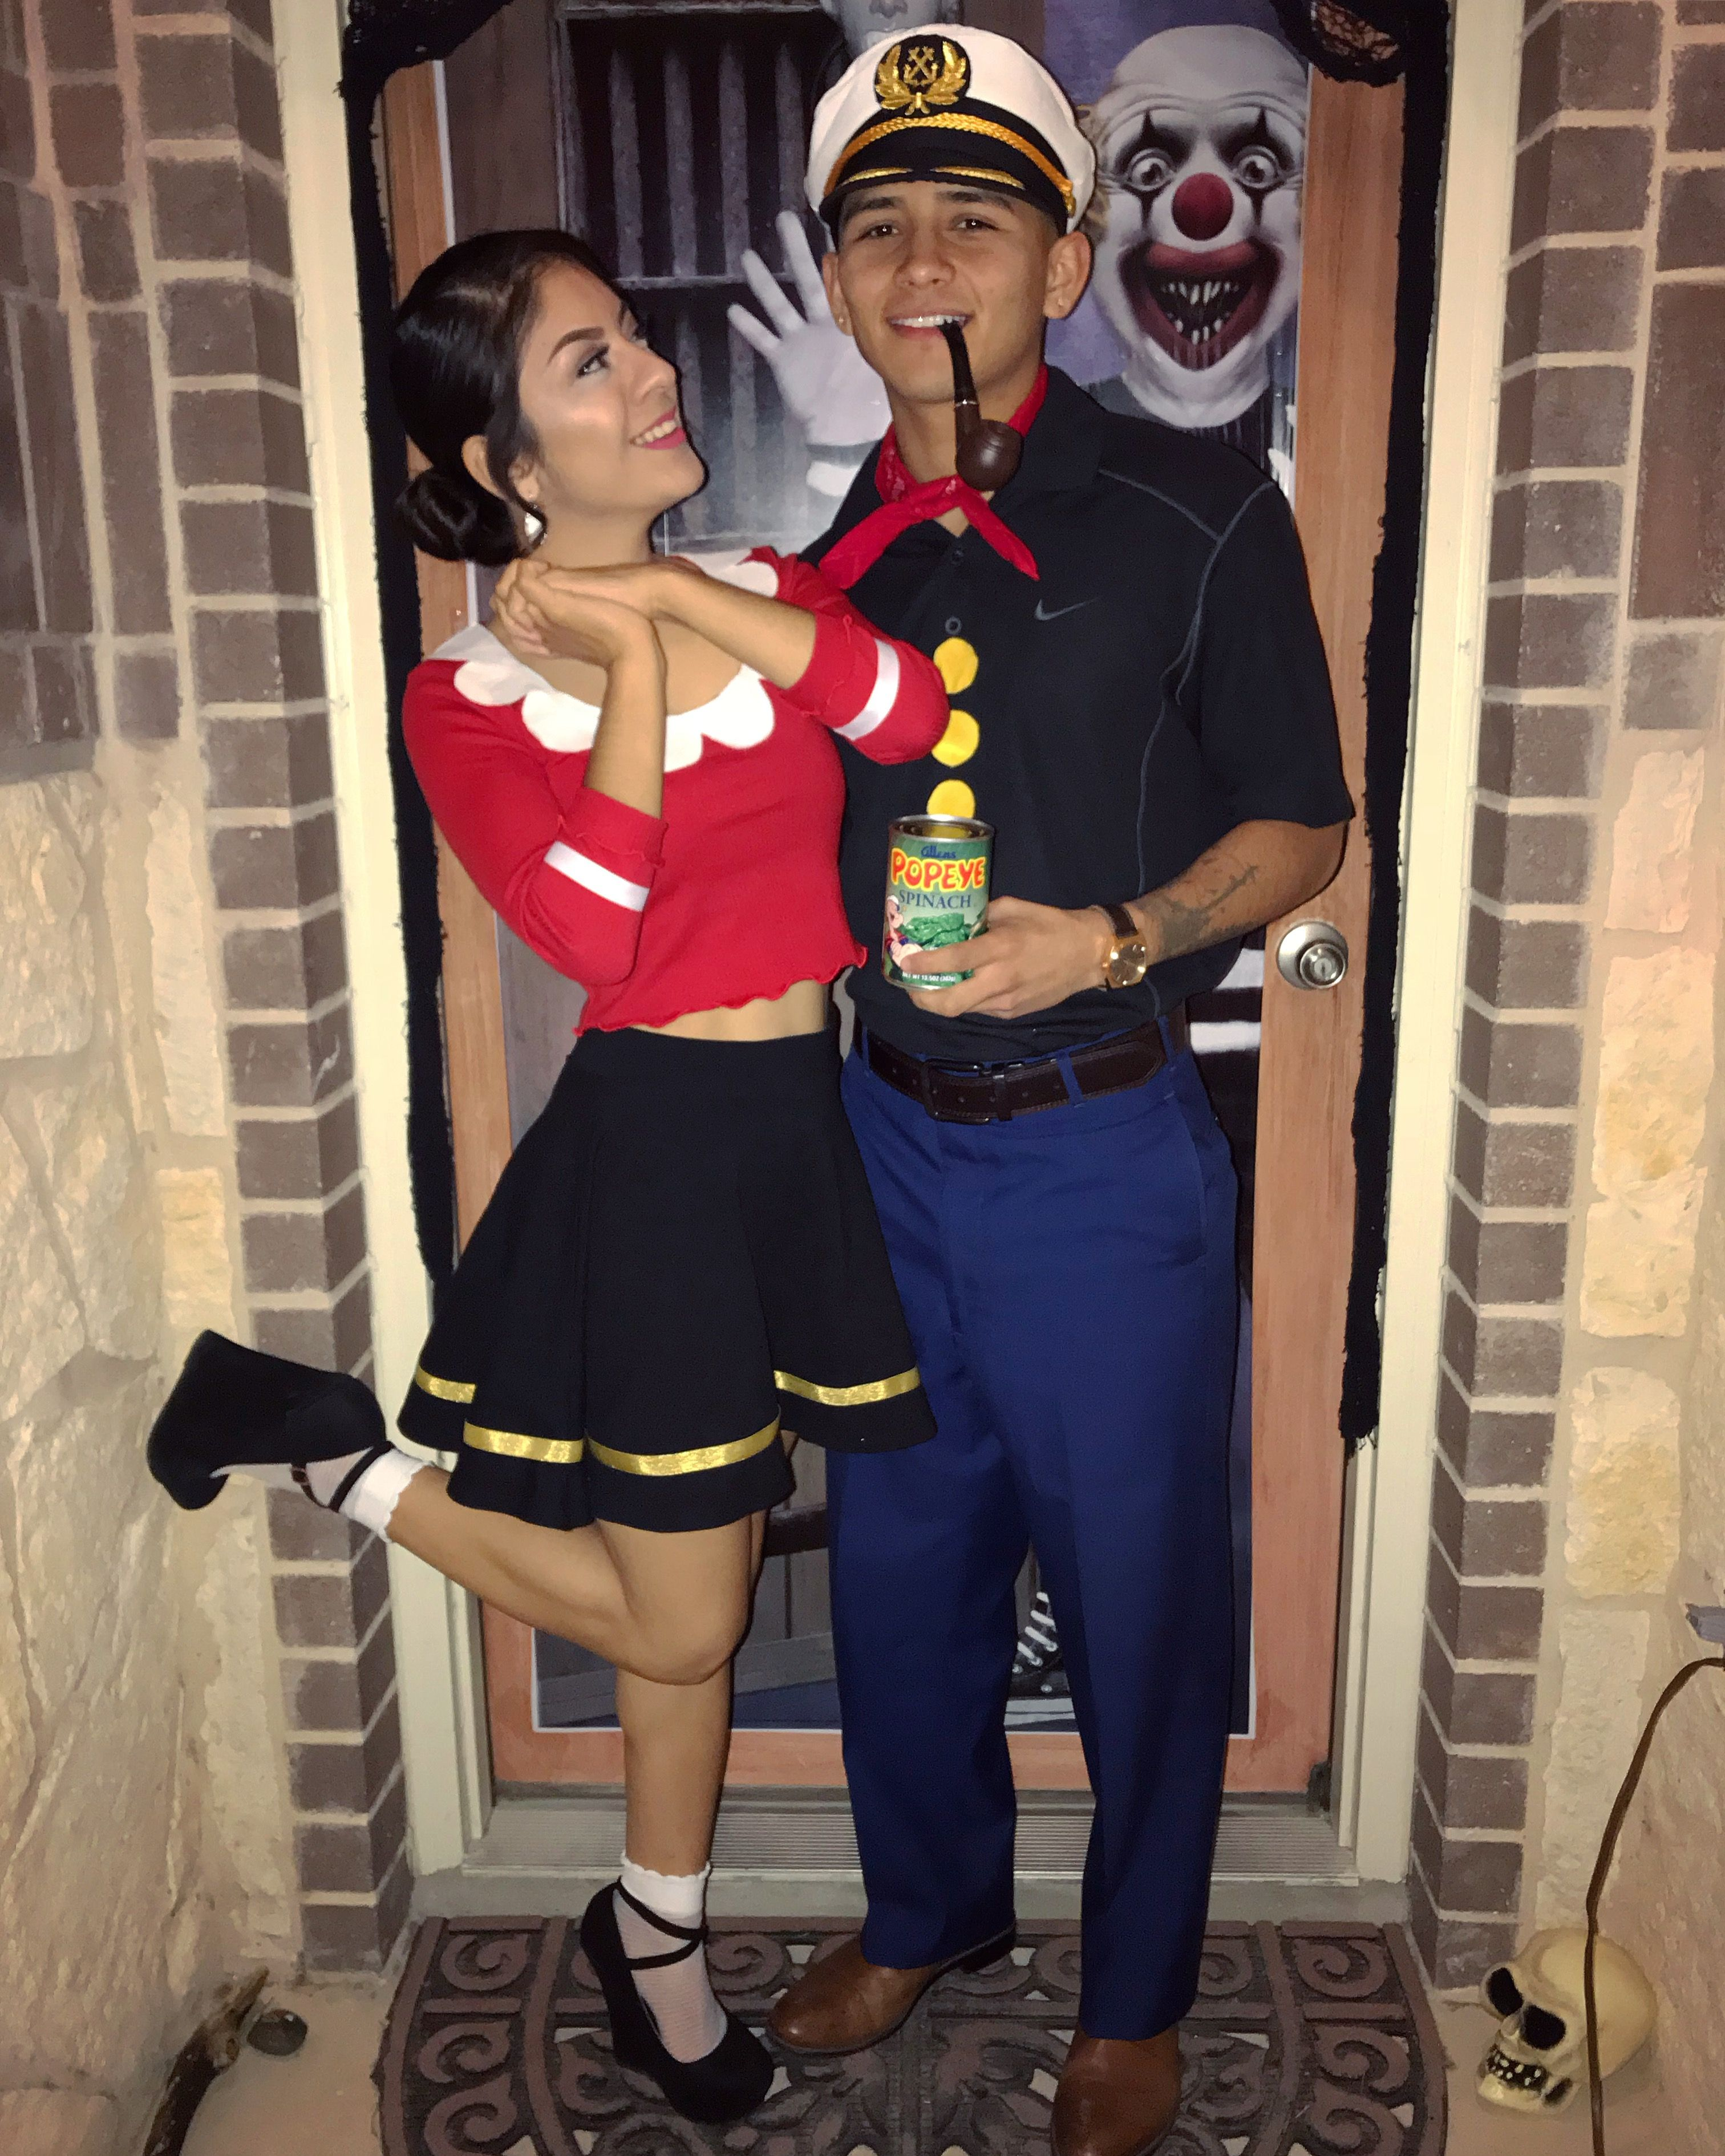 Popeye olive oyl costume #couplescostume #popeye #popeyecostume #oliveoyl #haloweencouple  sc 1 st  Pinterest & Popeye olive oyl costume #couplescostume #popeye #popeyecostume ...